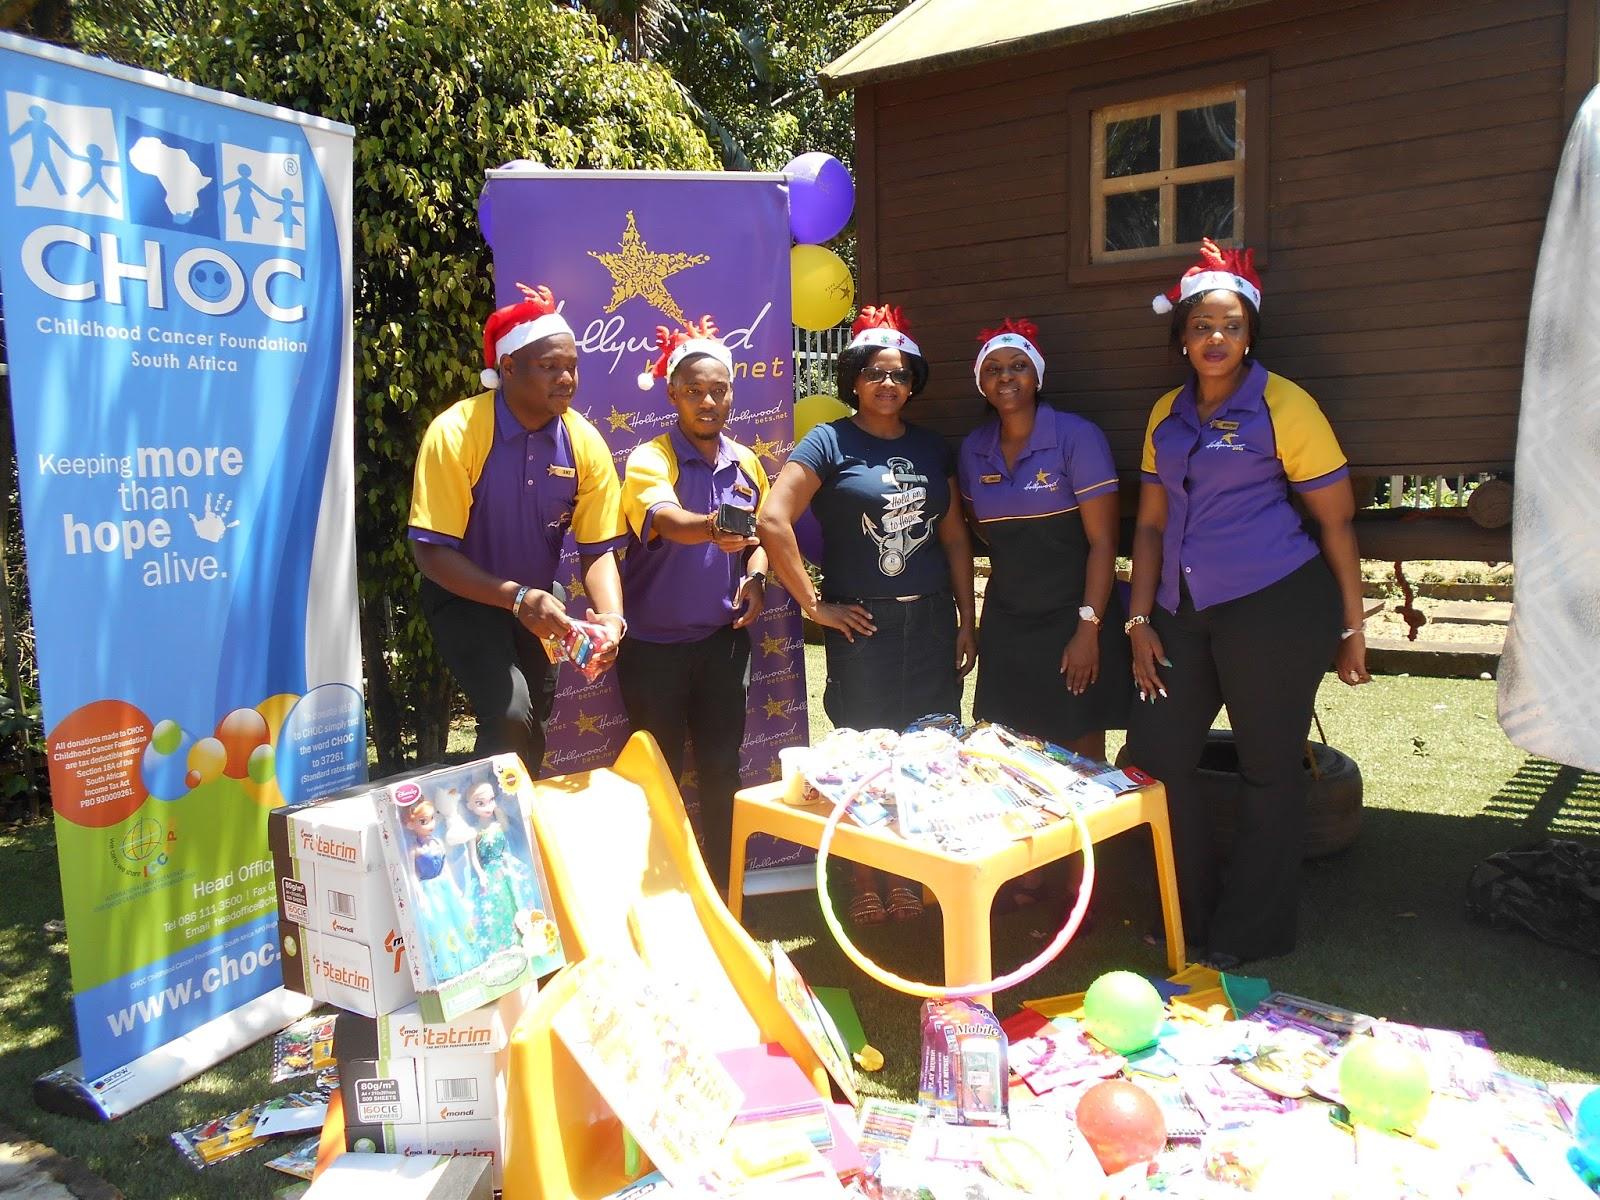 CHOC- Childhood Cancer Foundation in Pietermaritzburg - Hollywoodbets Mbuyisa donation